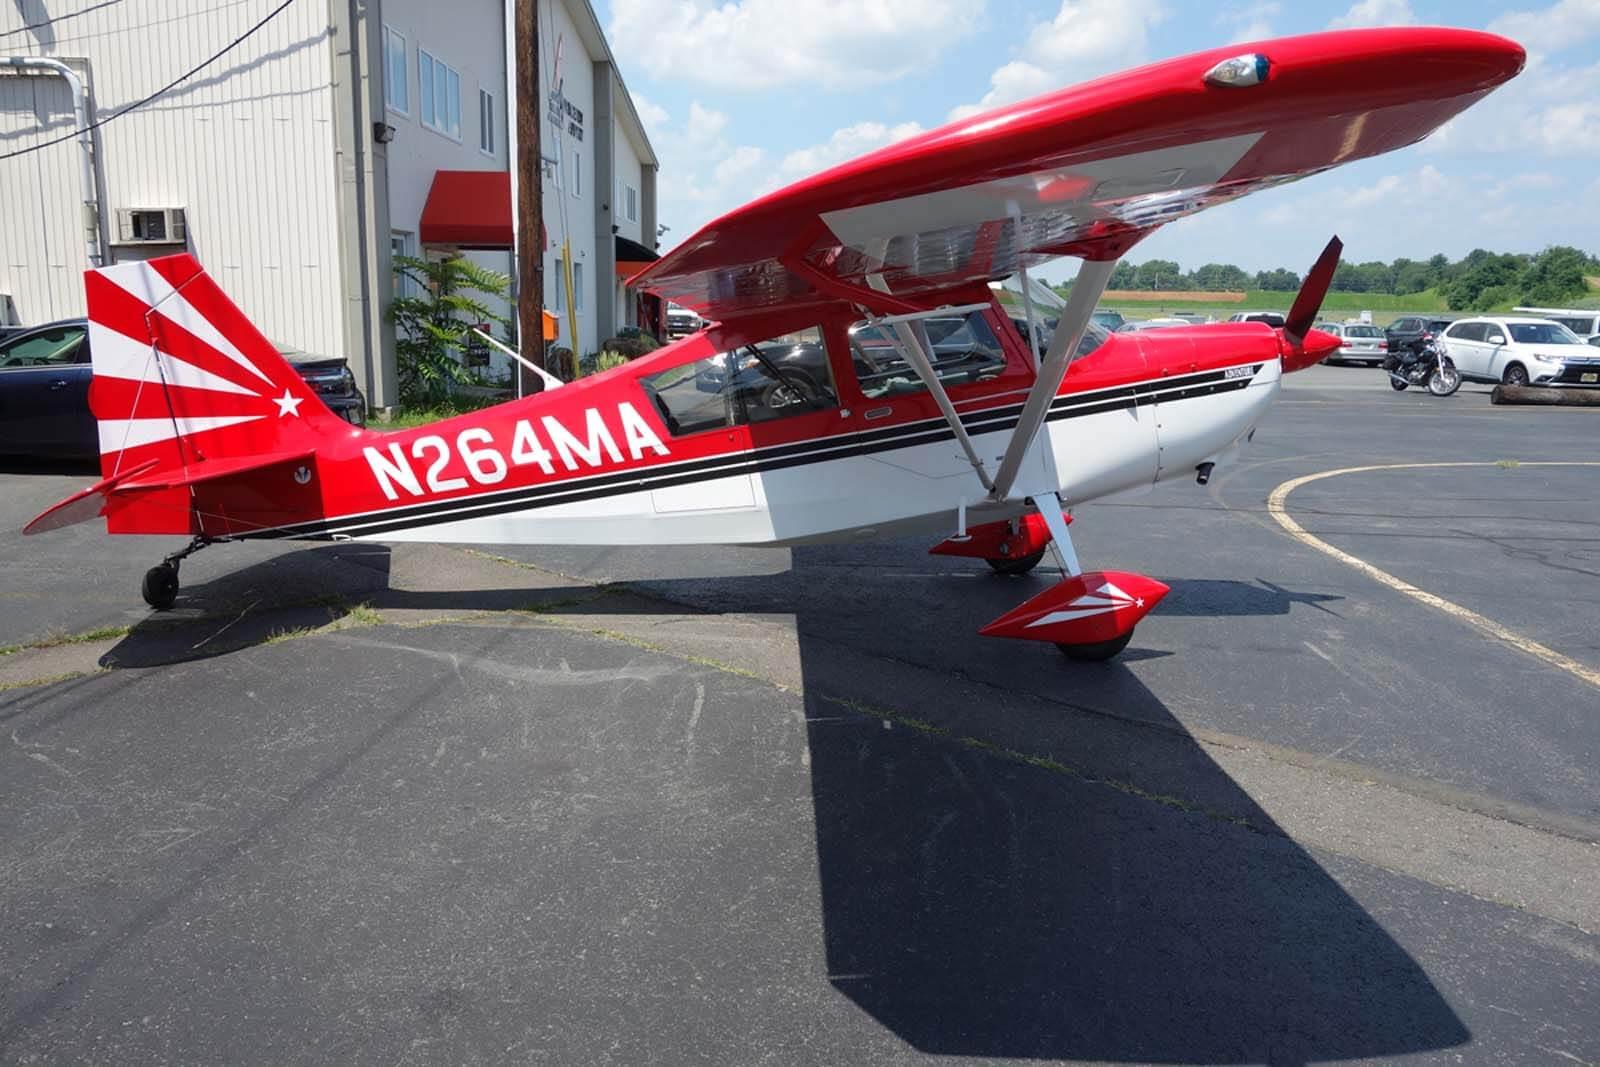 2004 American Champion Aircraft Adventurer 7GCAA – Contact Ken Nierenberg at 609-731-4628 for details